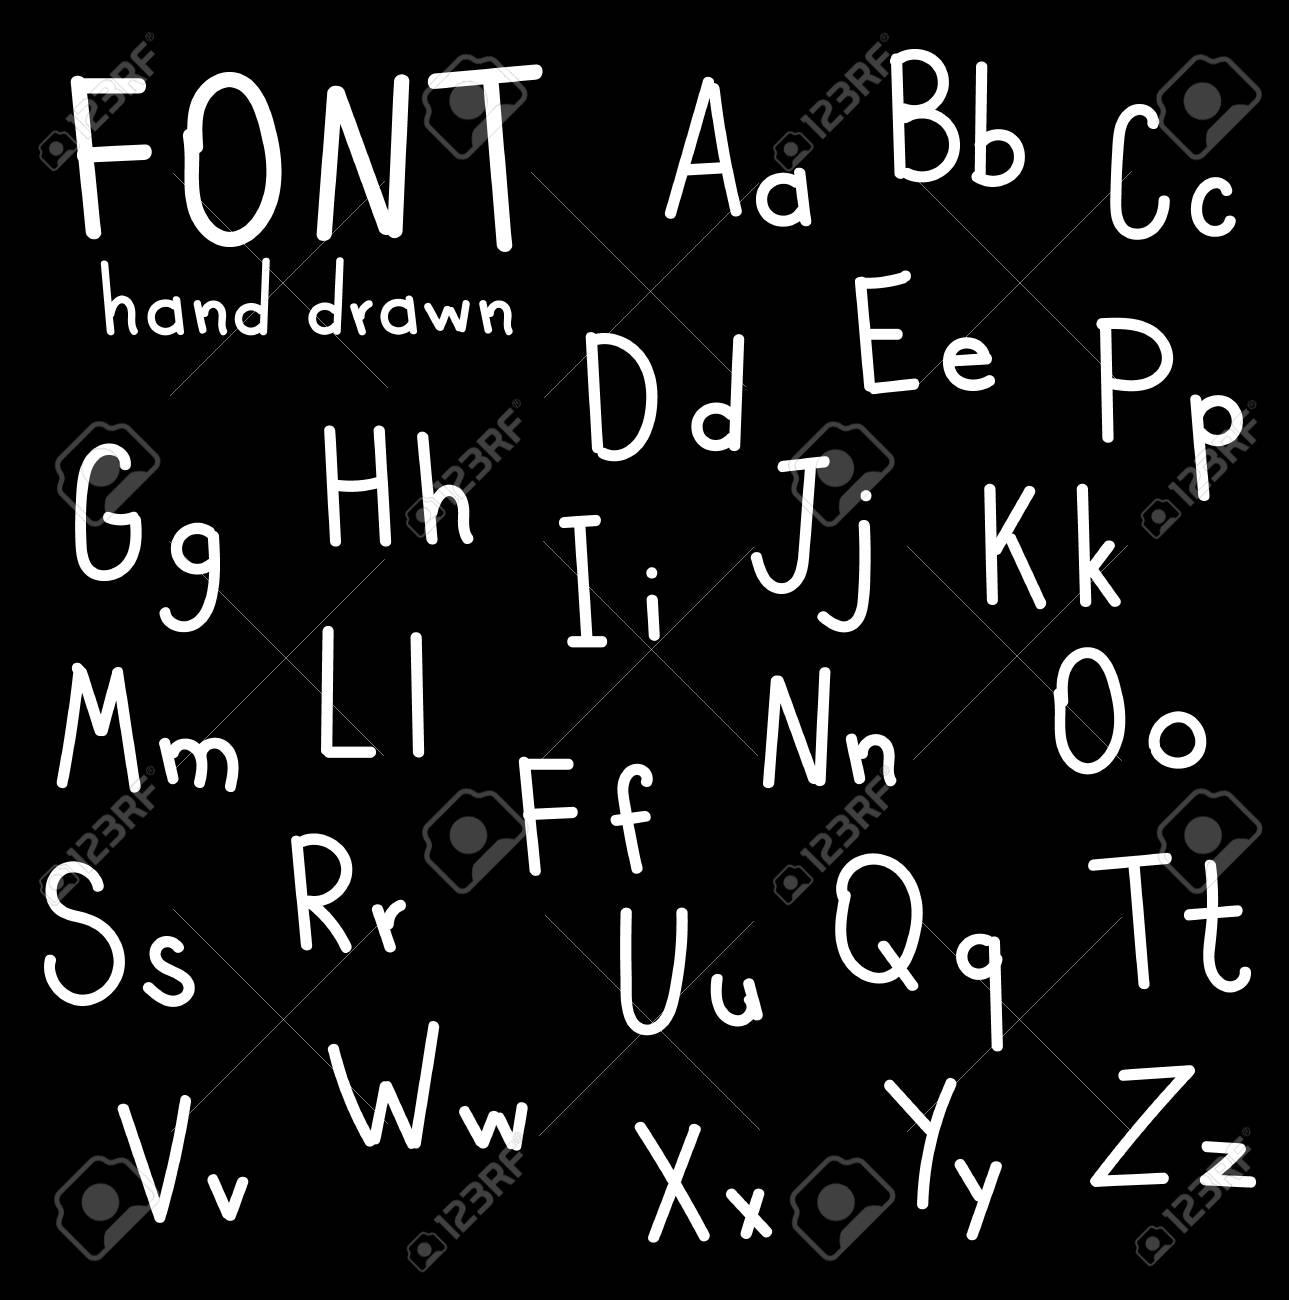 Hand Font Draw Handwritten Alphabet Brush Style Modern Calligraphy Printed Lettering Vector